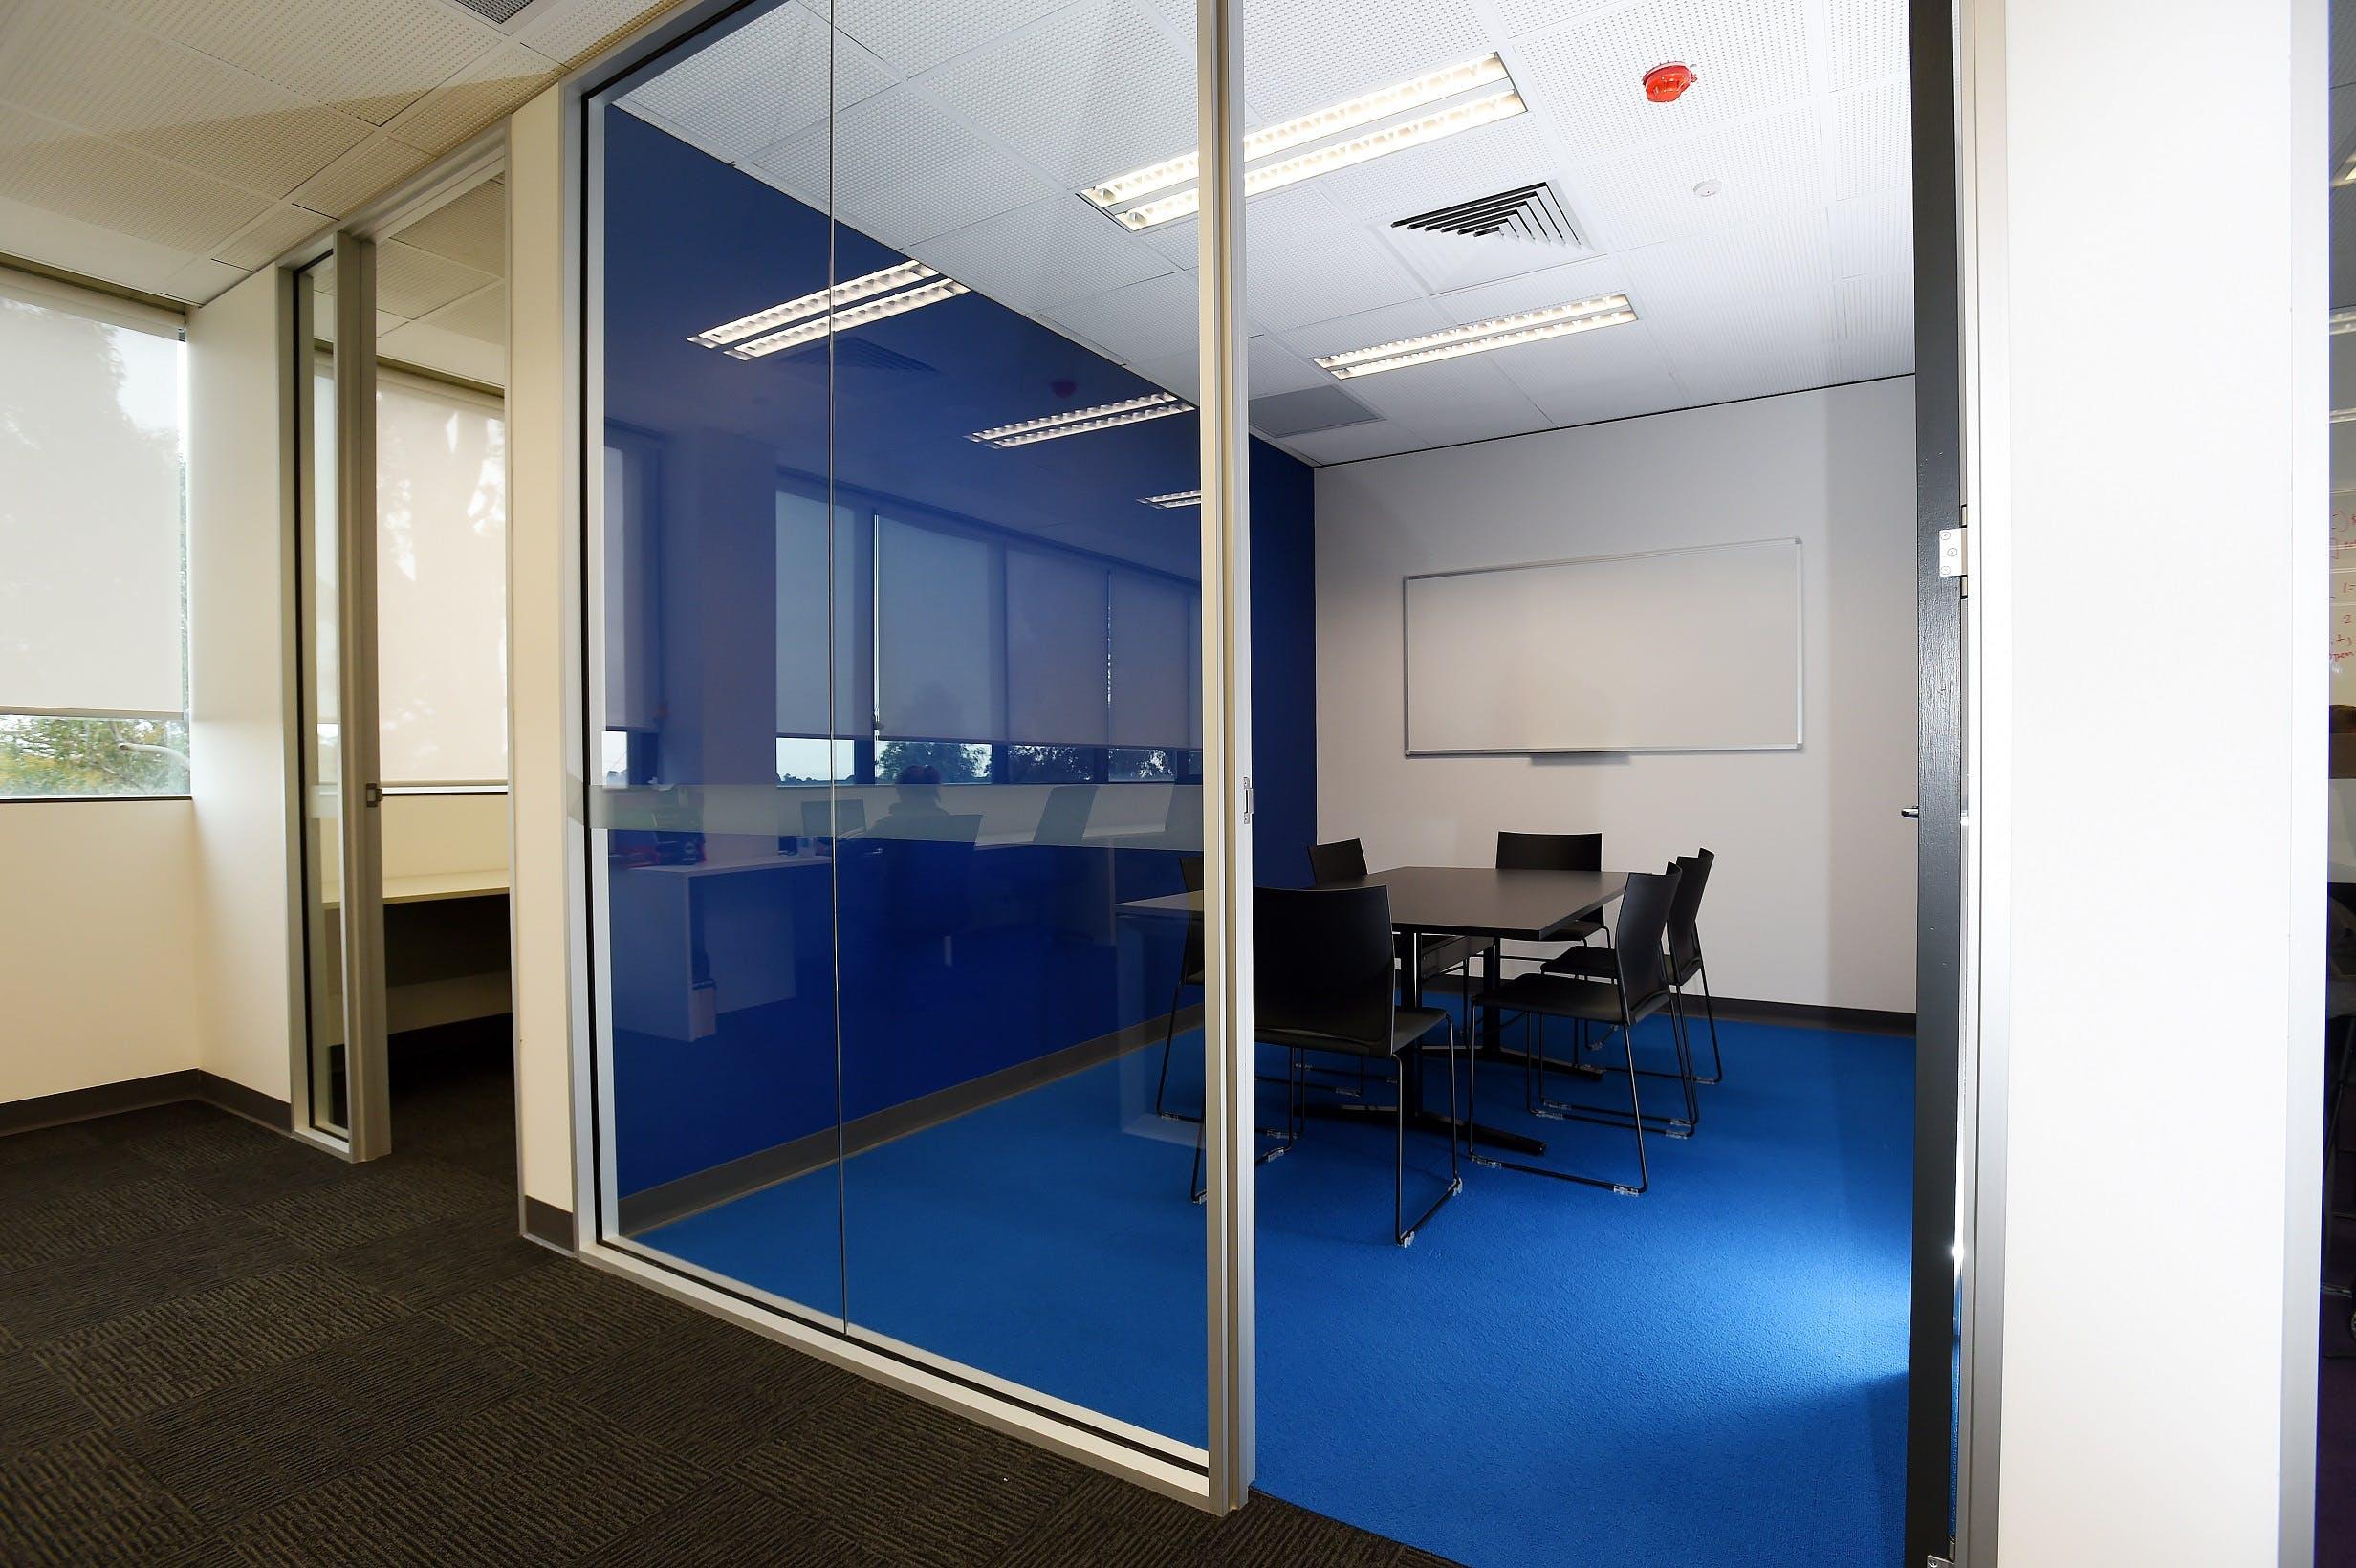 Meeting Room 1, meeting room at CO-HAB Tonsley, image 1